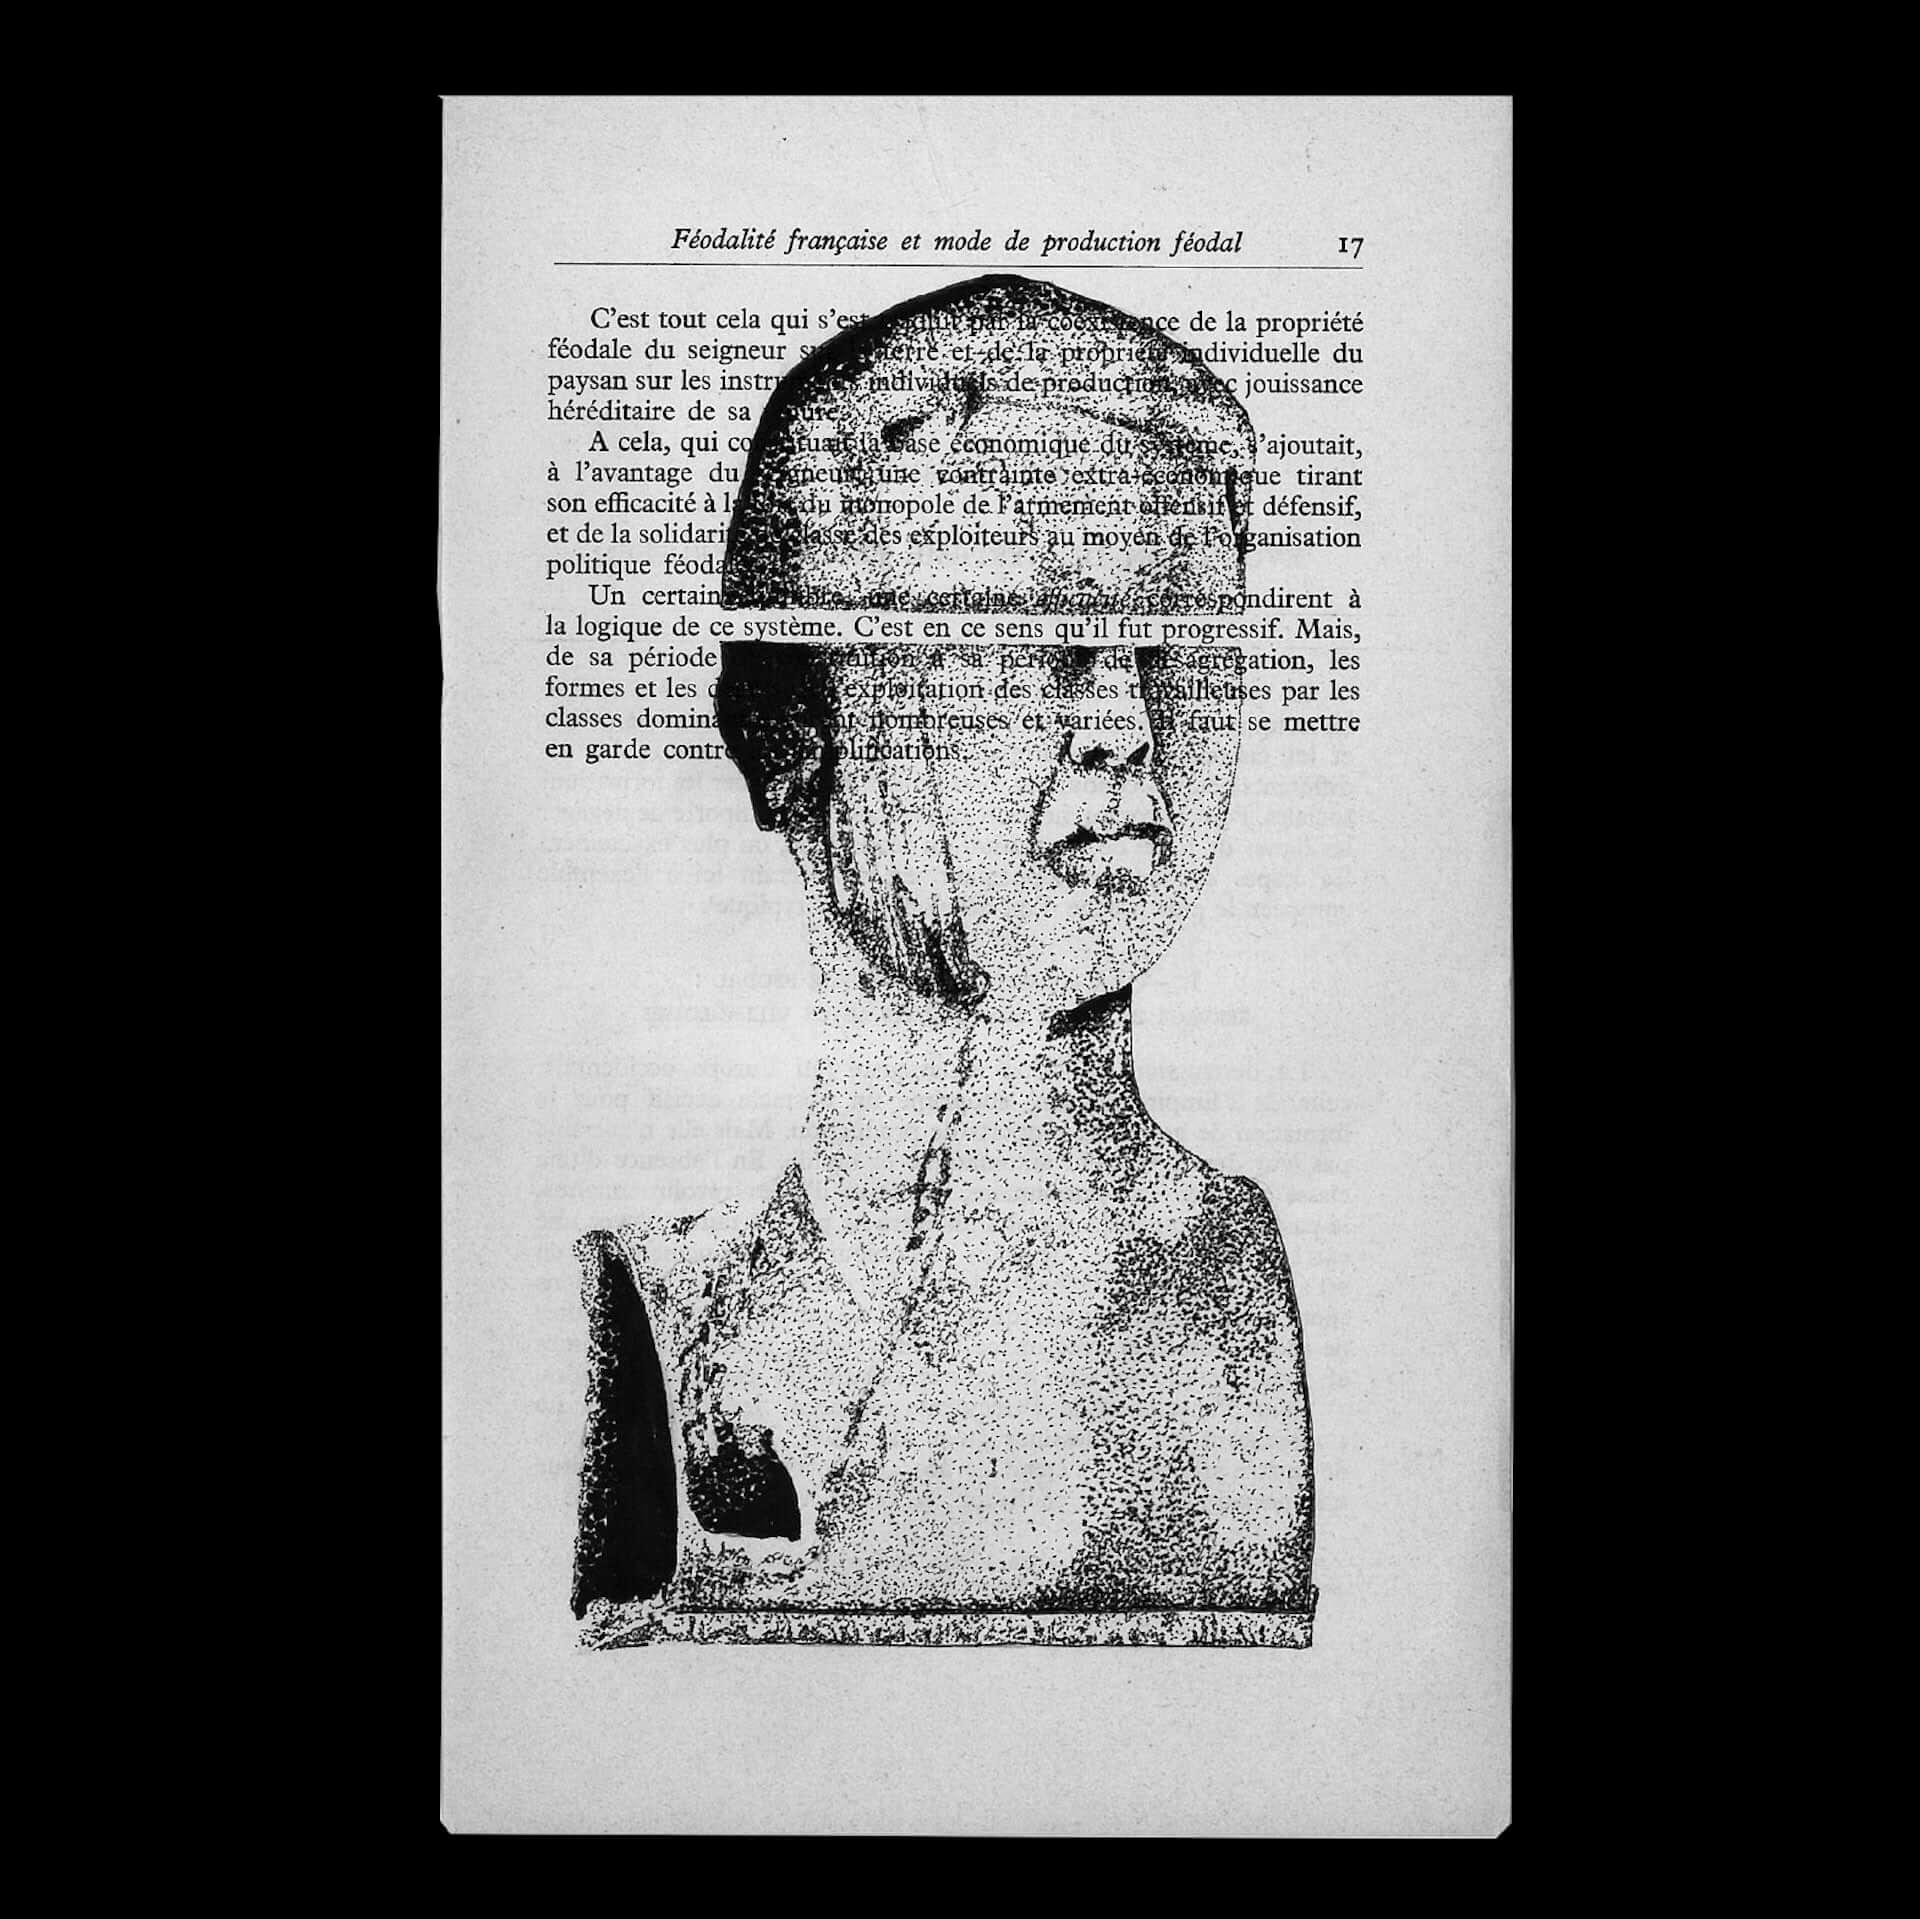 VJ・映像作家としても活躍する悳祐介の個展<DOTS>がLAID BUGにて開催決定!モノクロームの点描画作品を多数展示 art210304_yusuke-isao_9-1920x1919